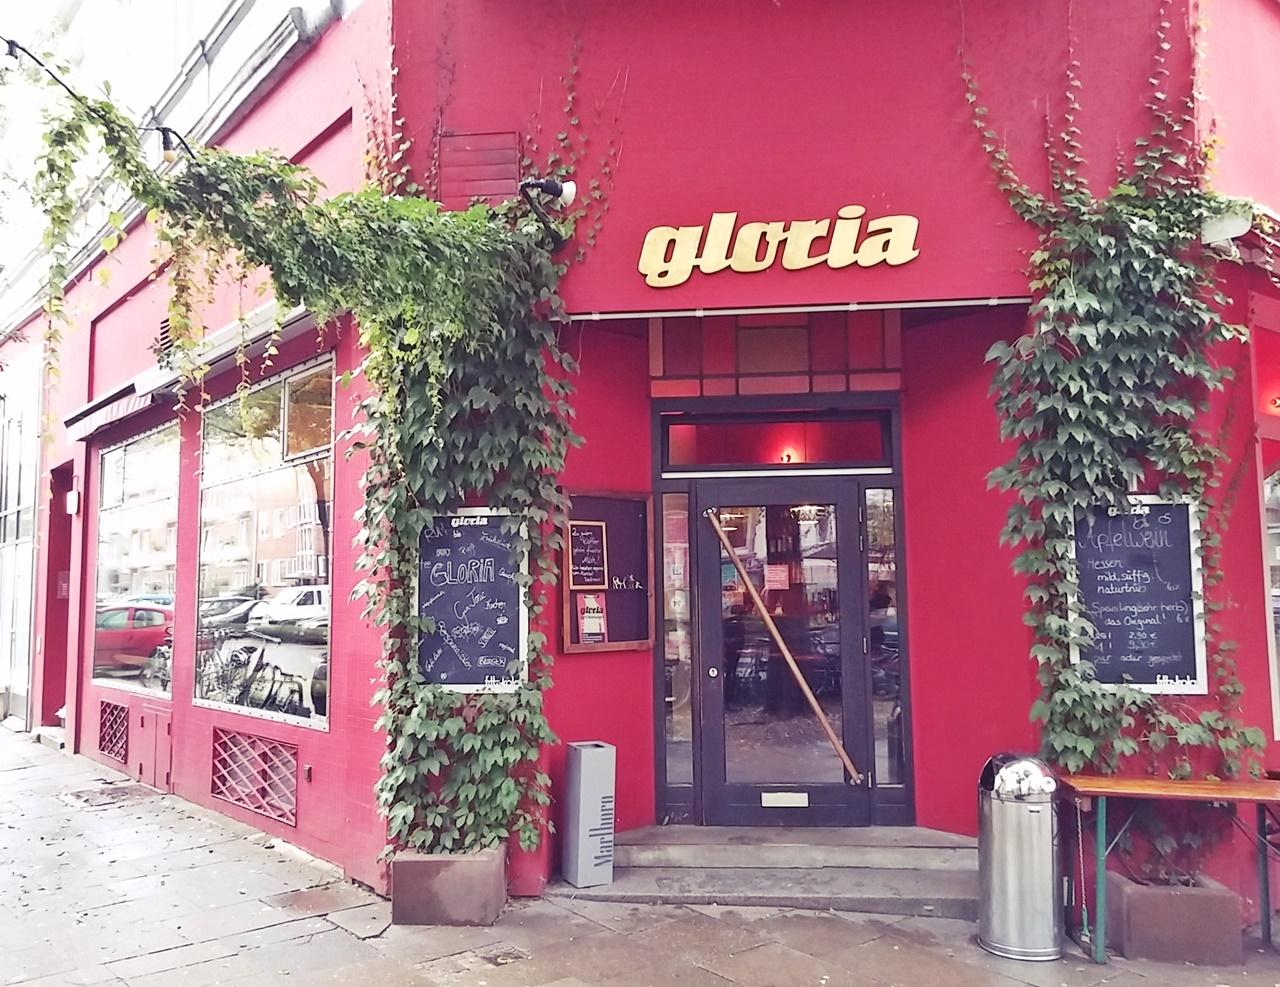 Cafébar gloria in der Bellealliancestraße